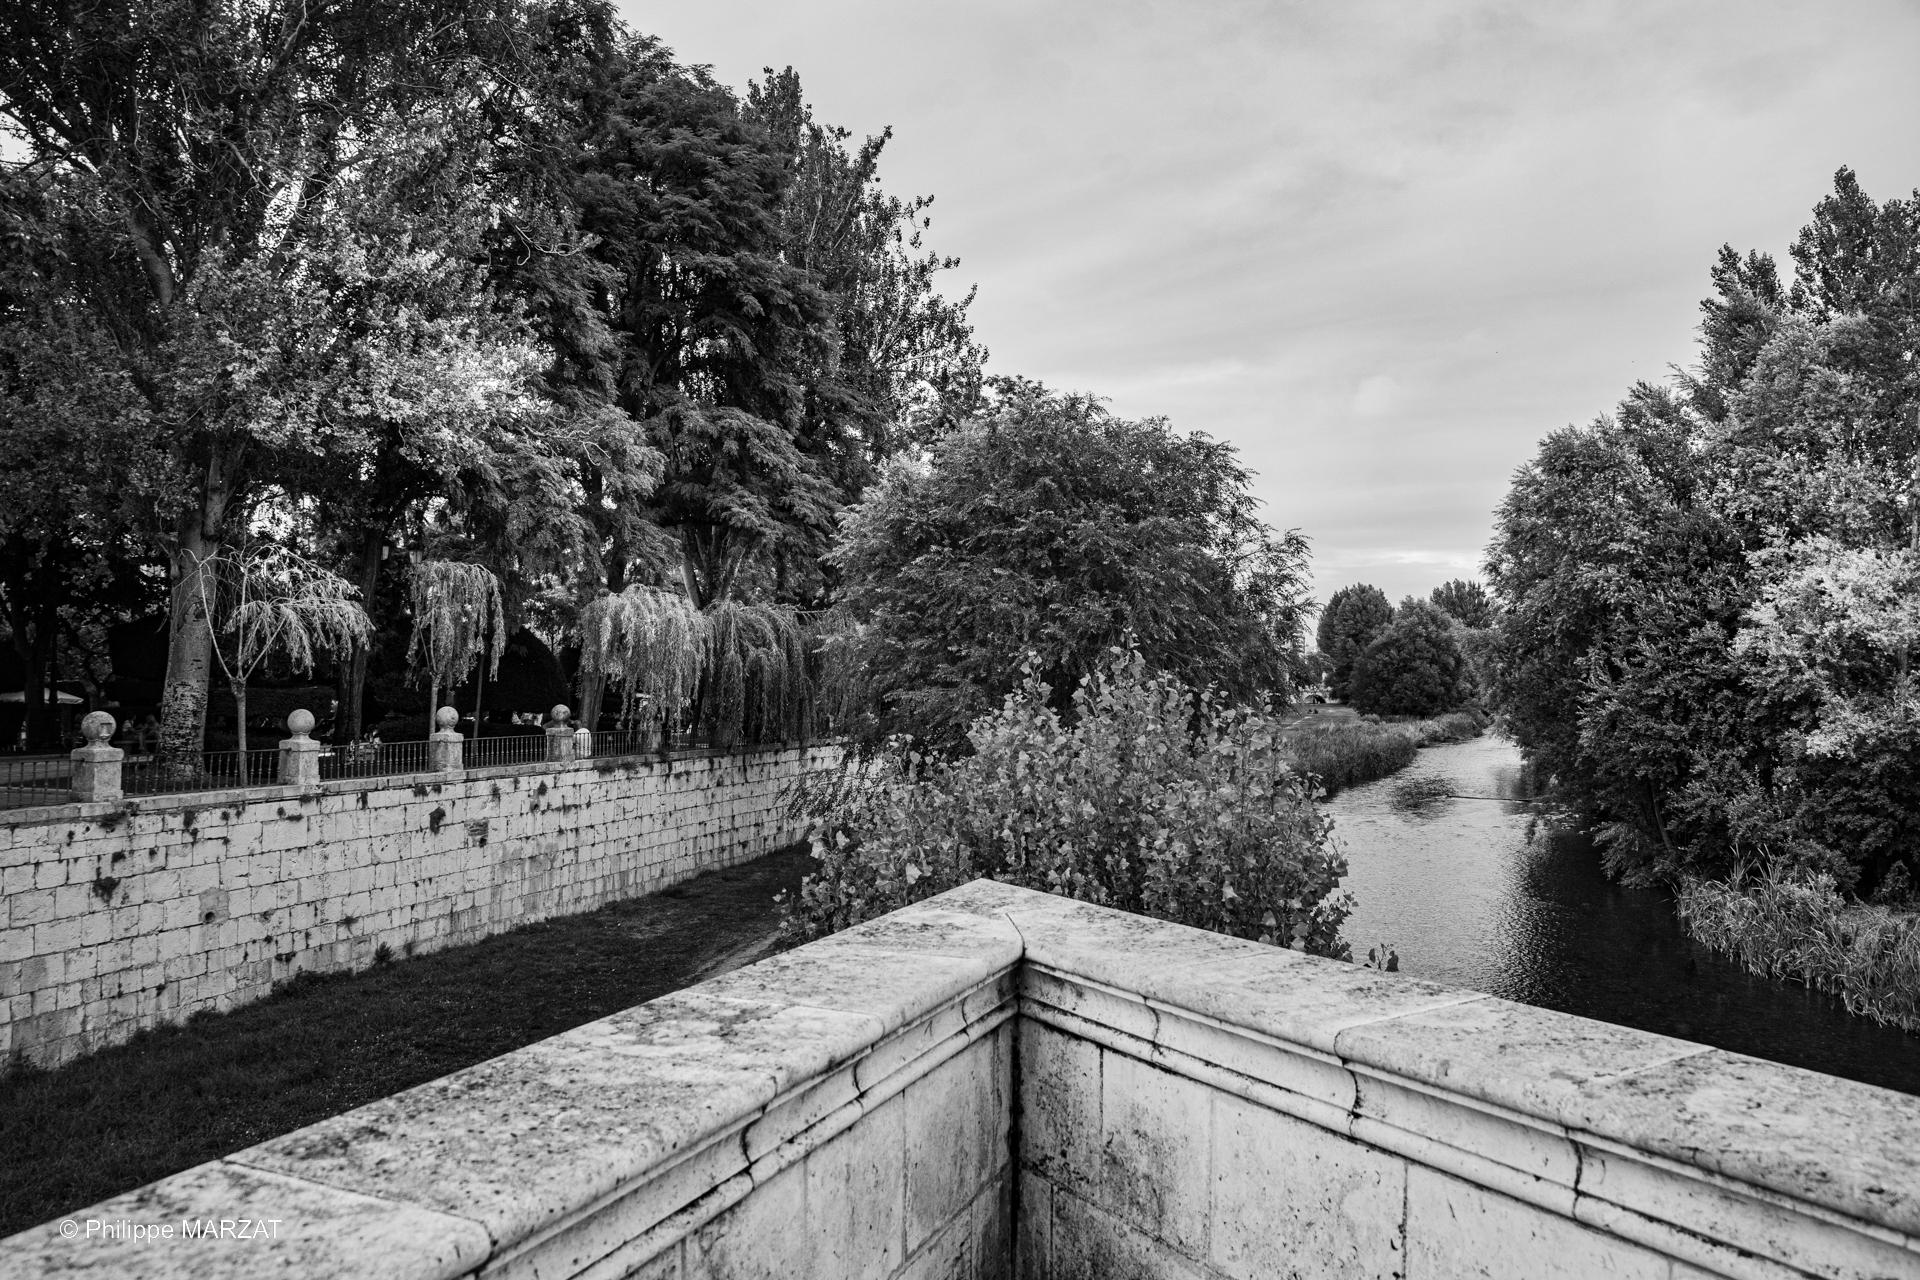 ©_PM__Burgos-00610